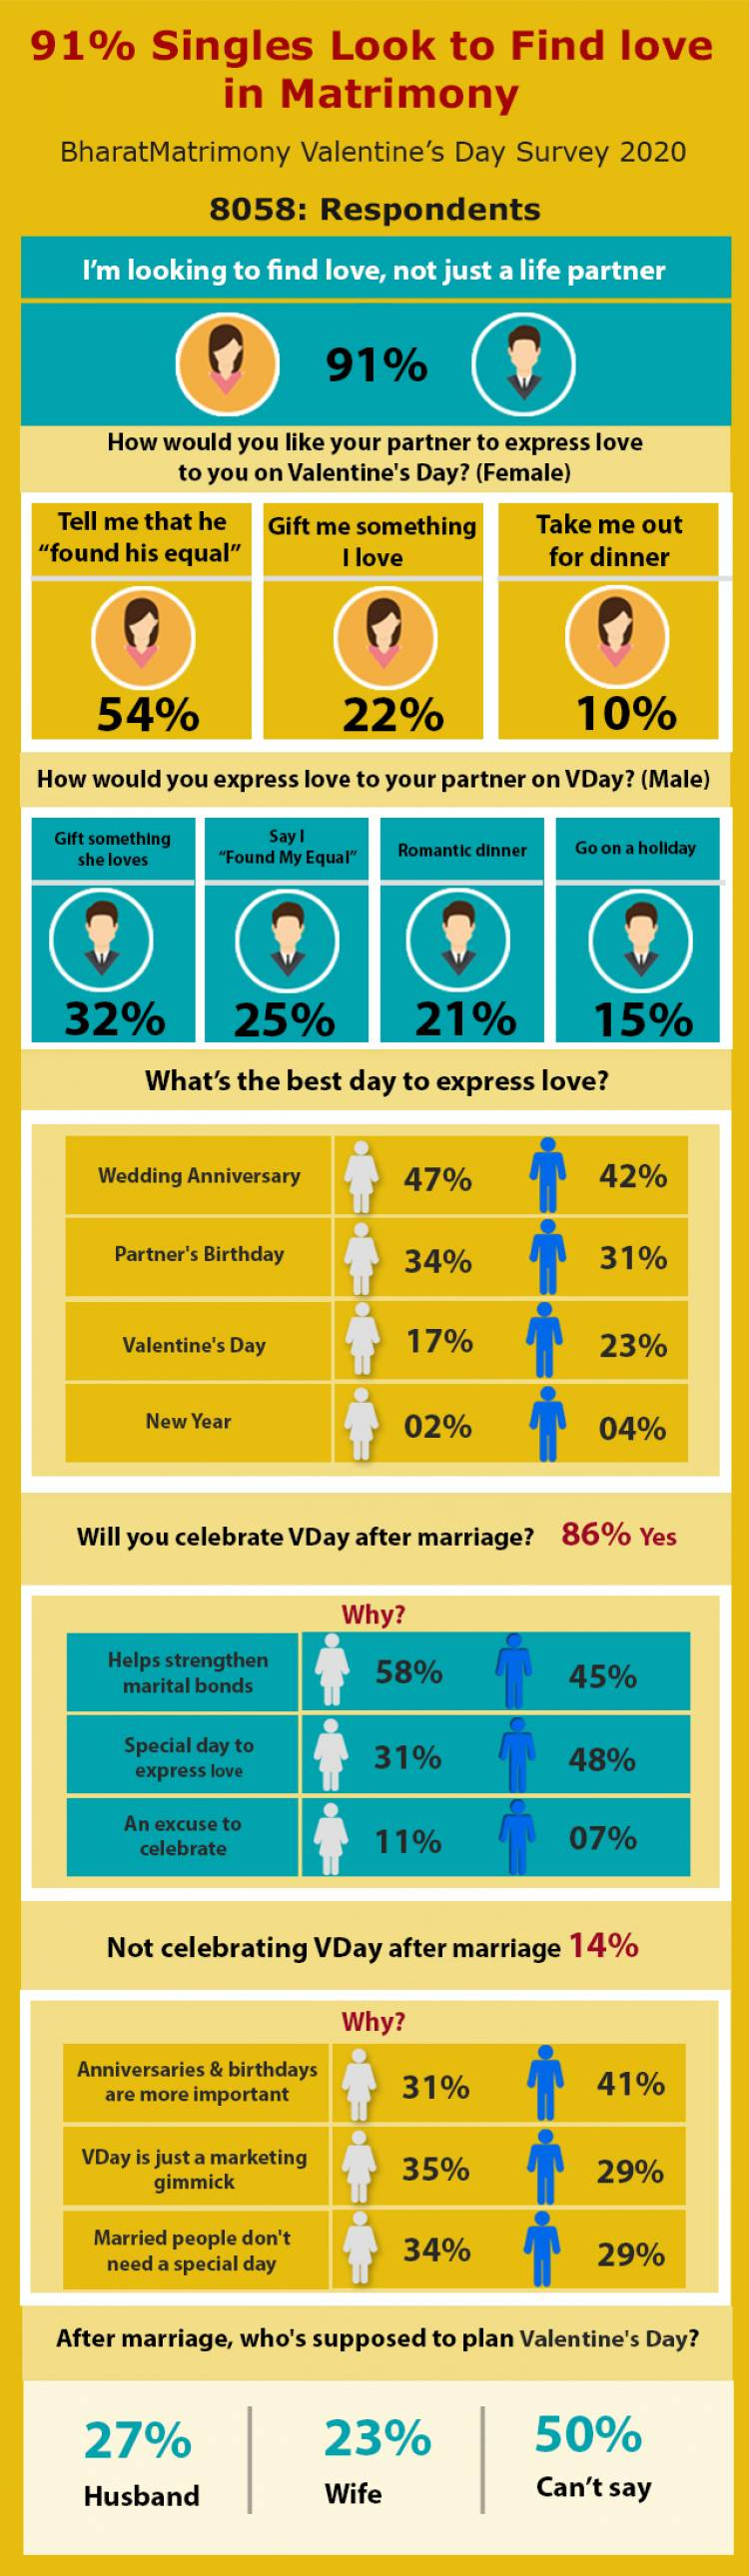 91% Indian Singles Look for Love in Matrimony: BharatMatrimony Valentine's Day Survey